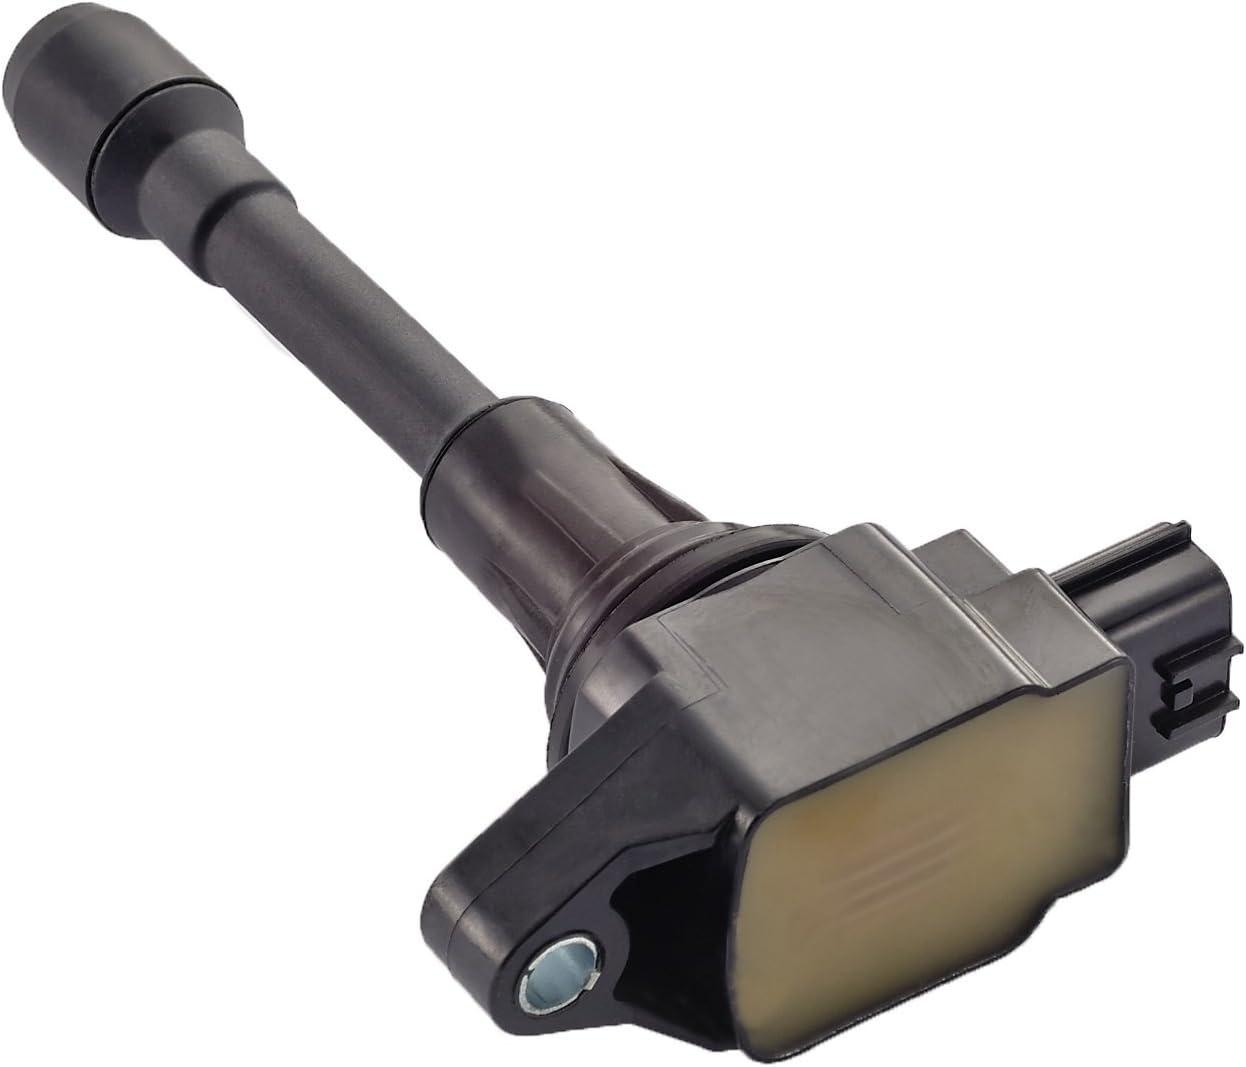 Amazon Com Ena Pack Of 4 Ignition Coils Compatible With 2008 2017 Nissan Altima Sentra Cube Rogue Versa Infiniti Fx50 1 6l 1 8l 2 5l Uf 549 C1696 Uf549 5c1753 Automotive